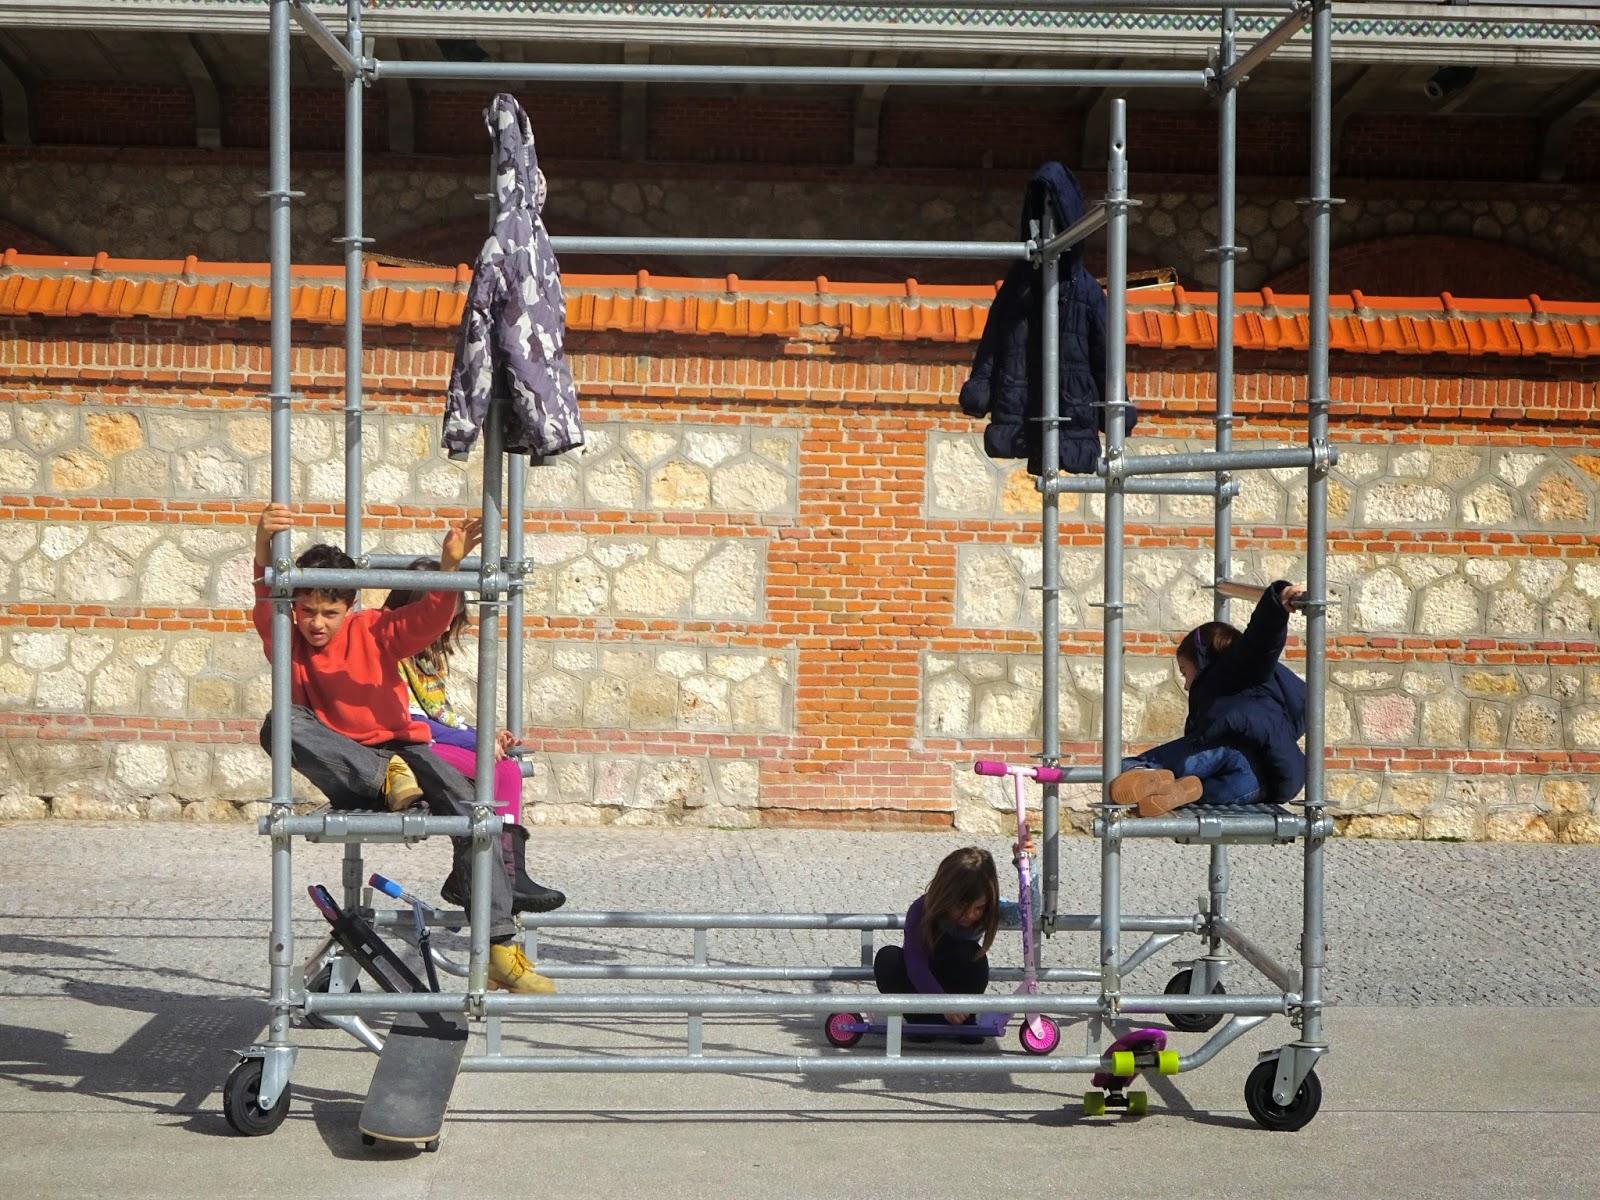 Matadero madrid las naves del español cultura cine teatro la cantina de matadero exposiciones guerrillas girls